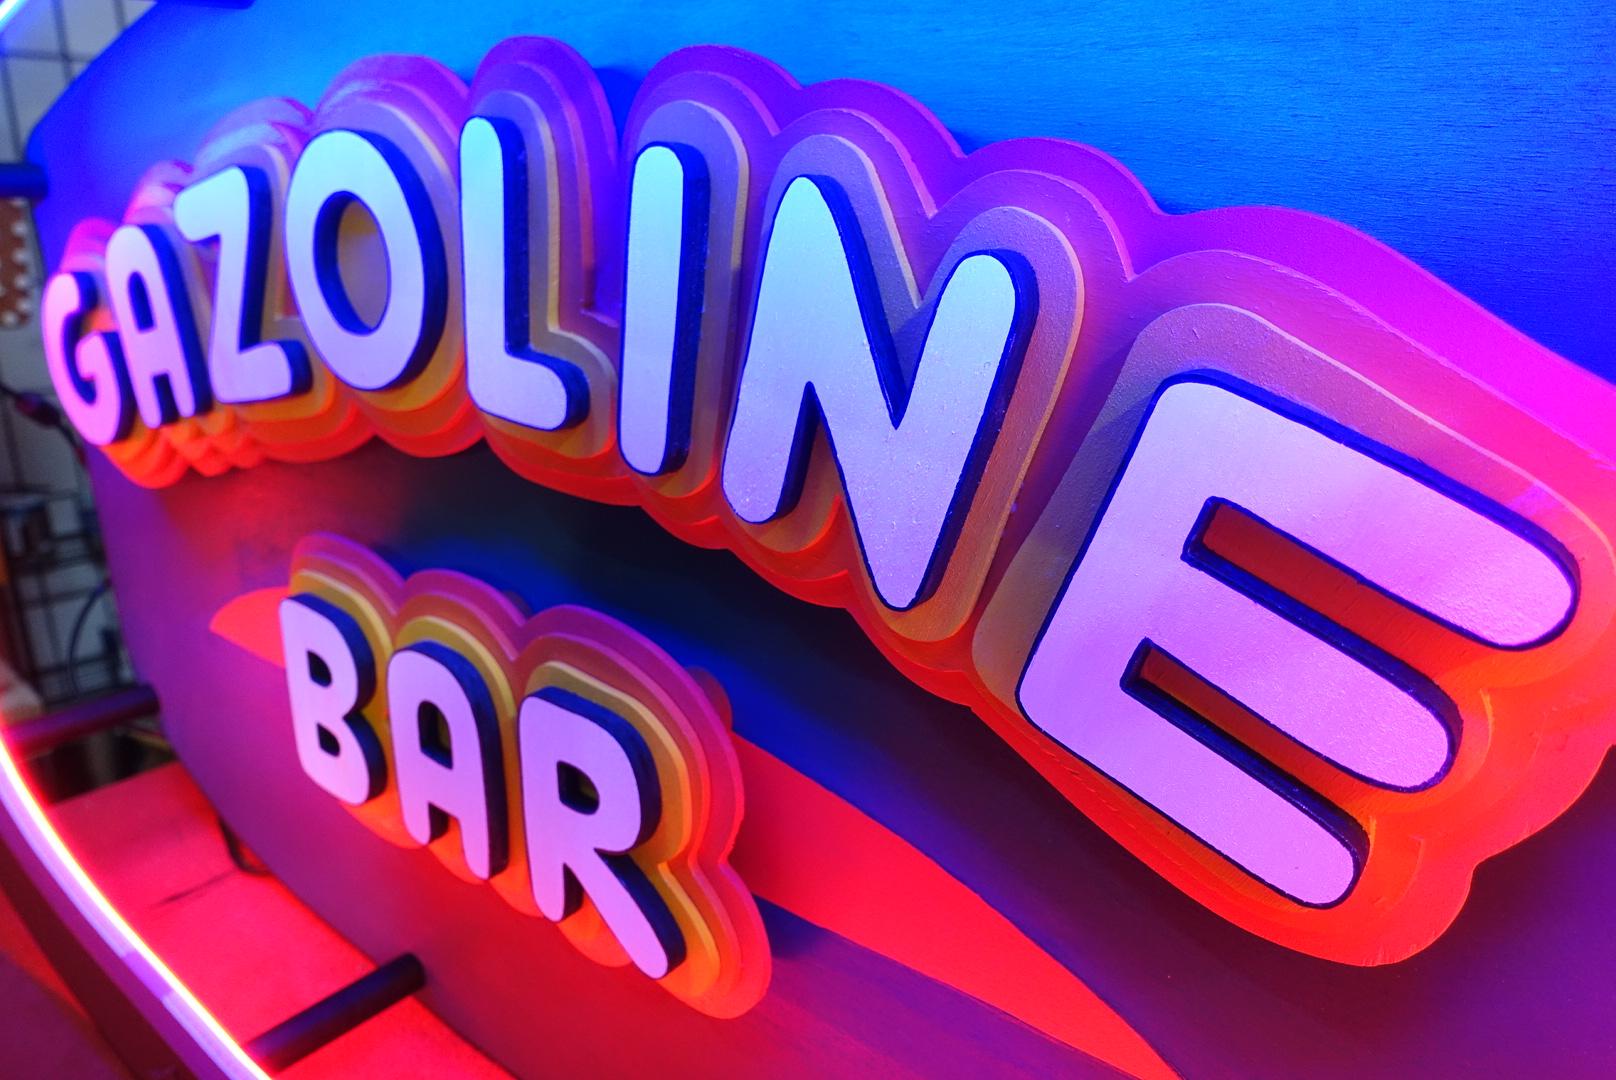 Gazoline Bar Enseigne lumineuse